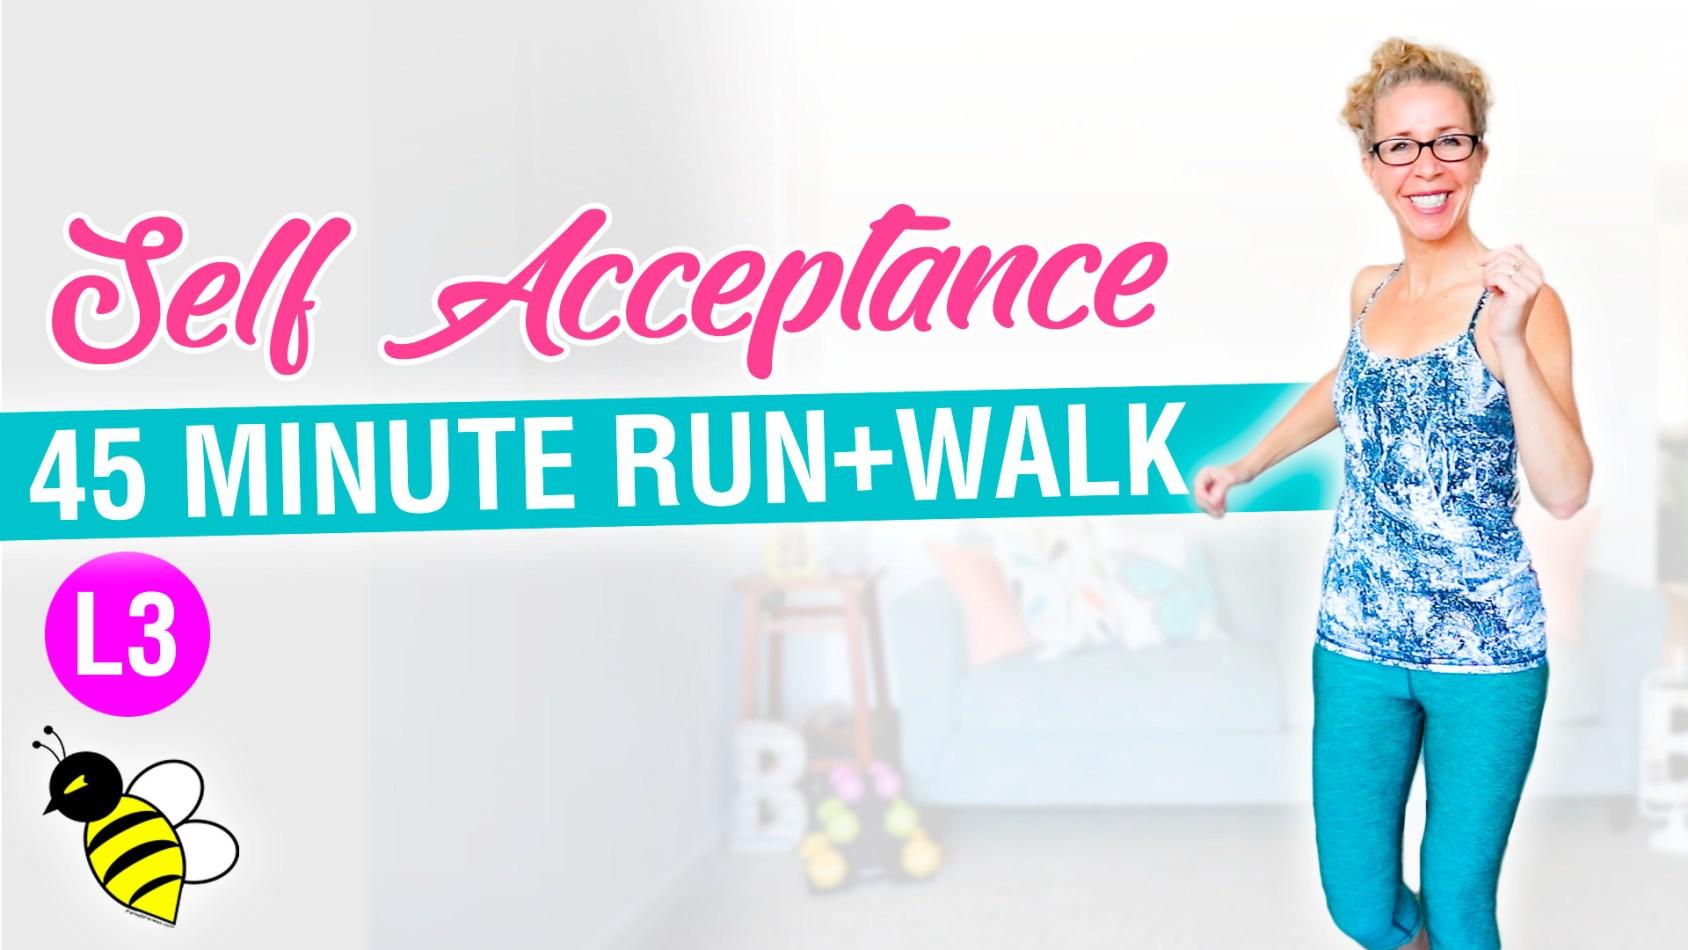 Self Acceptance 45 minute RUN + WALK workout